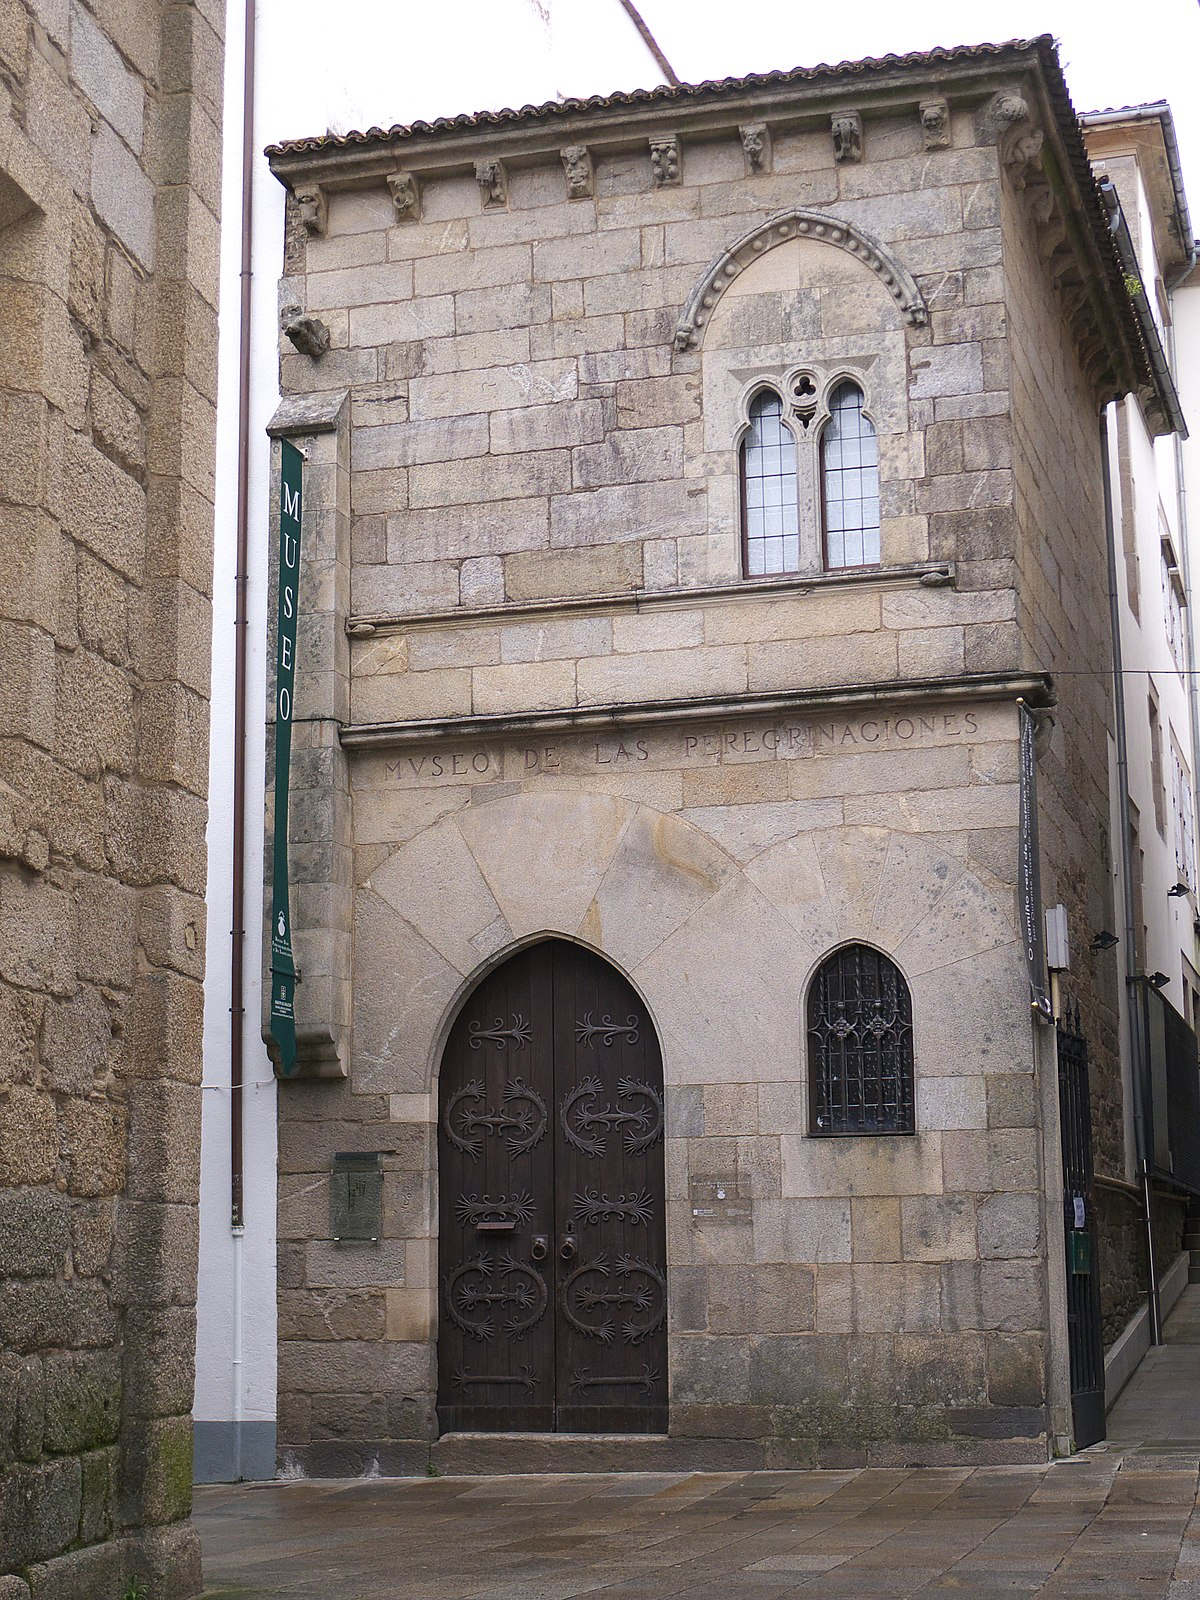 Casa g tica santiago de compostela wikip dia a for Casa revival gotica